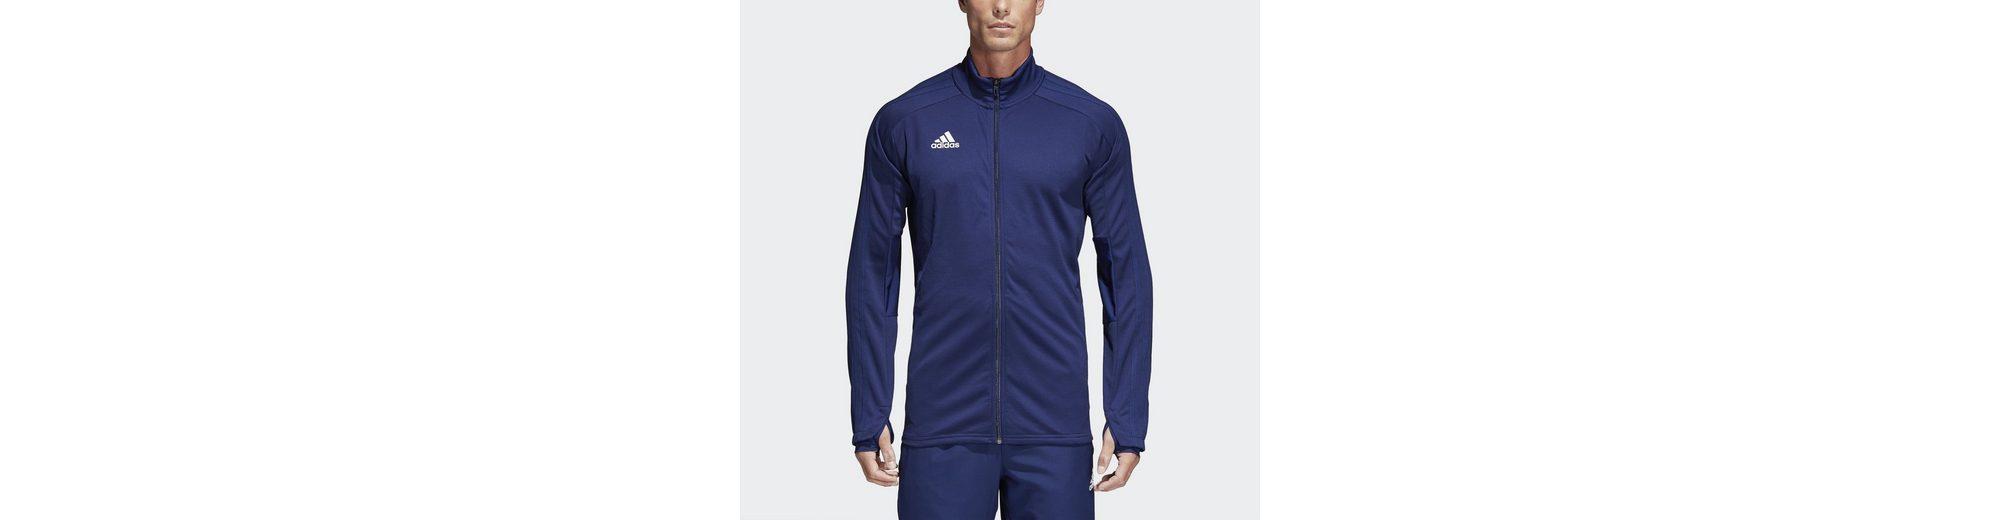 adidas Performance Funktions-Kapuzensweatjacke Condivo 18 Jacke